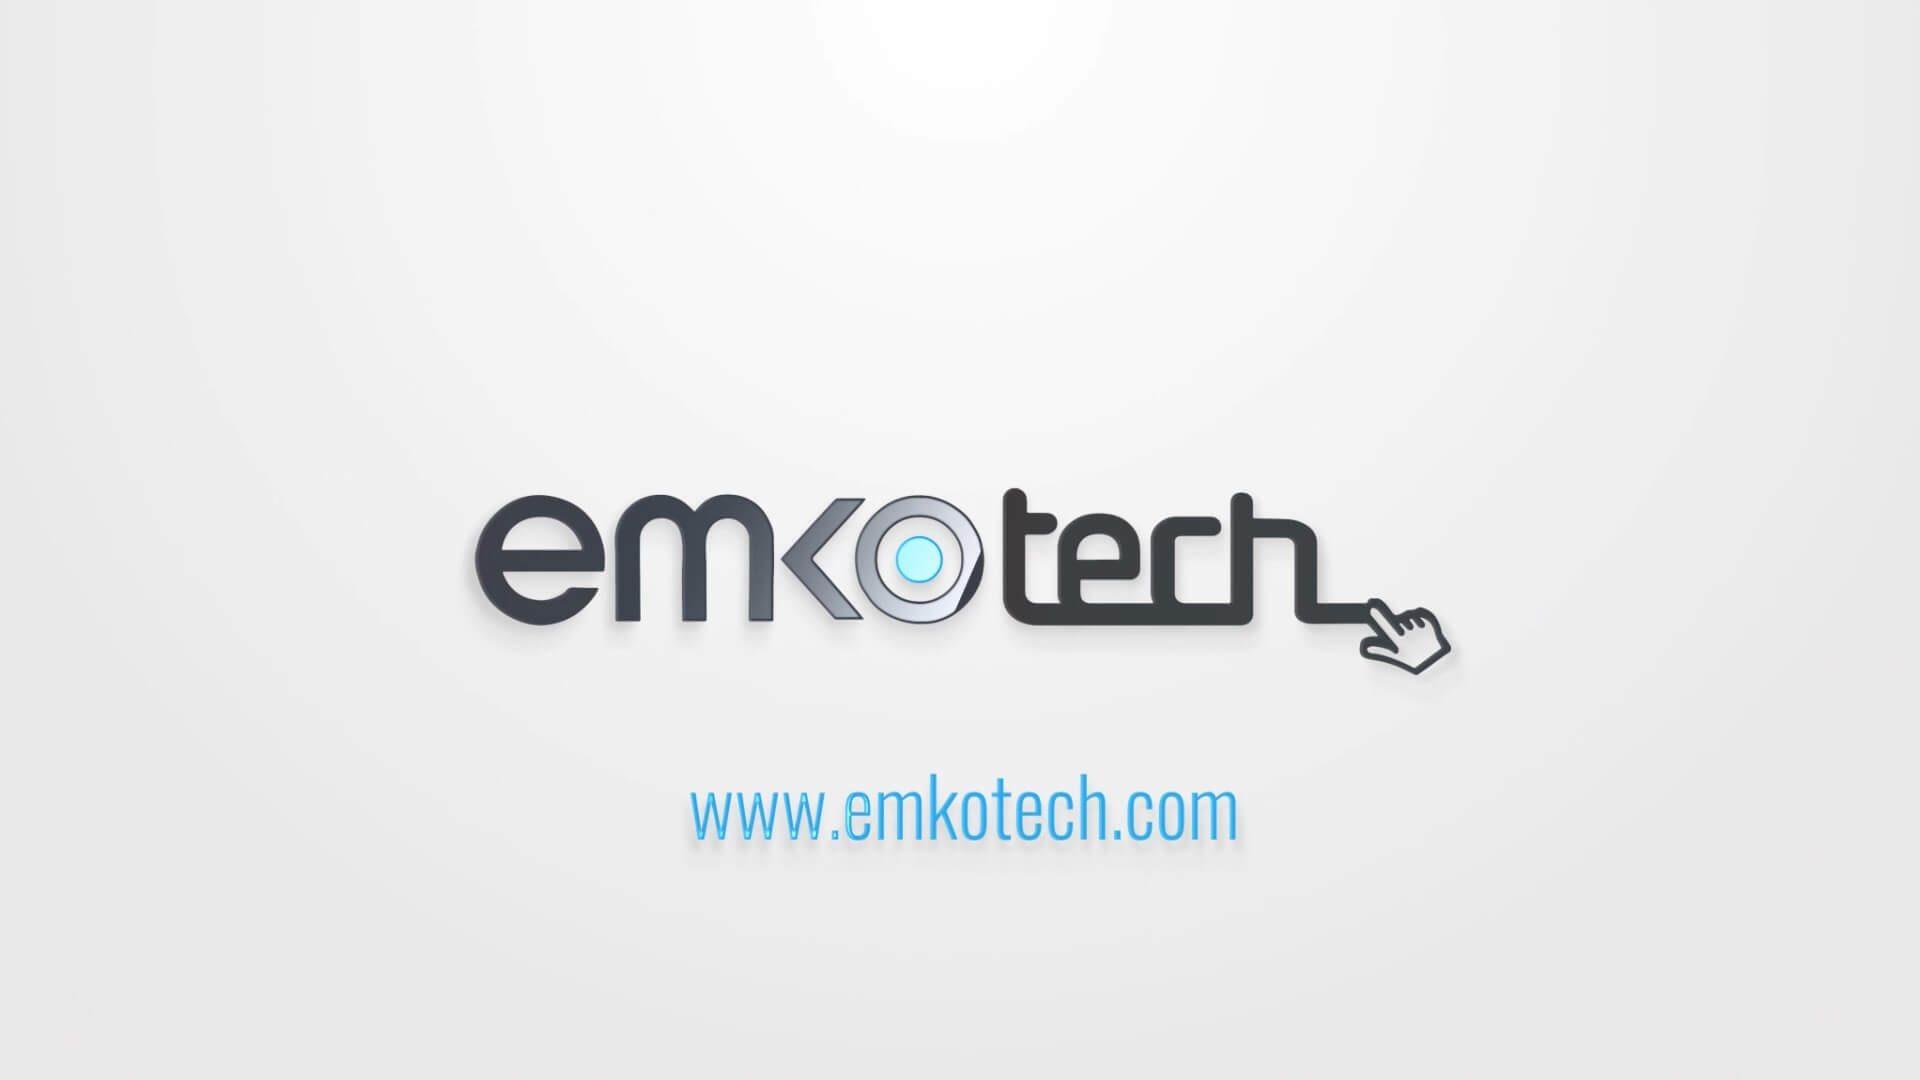 emko go yuksek kalite.mp4 snapshot 00.07 1920x1080 - Emkotech GO Ürün Tanıtım Filmi